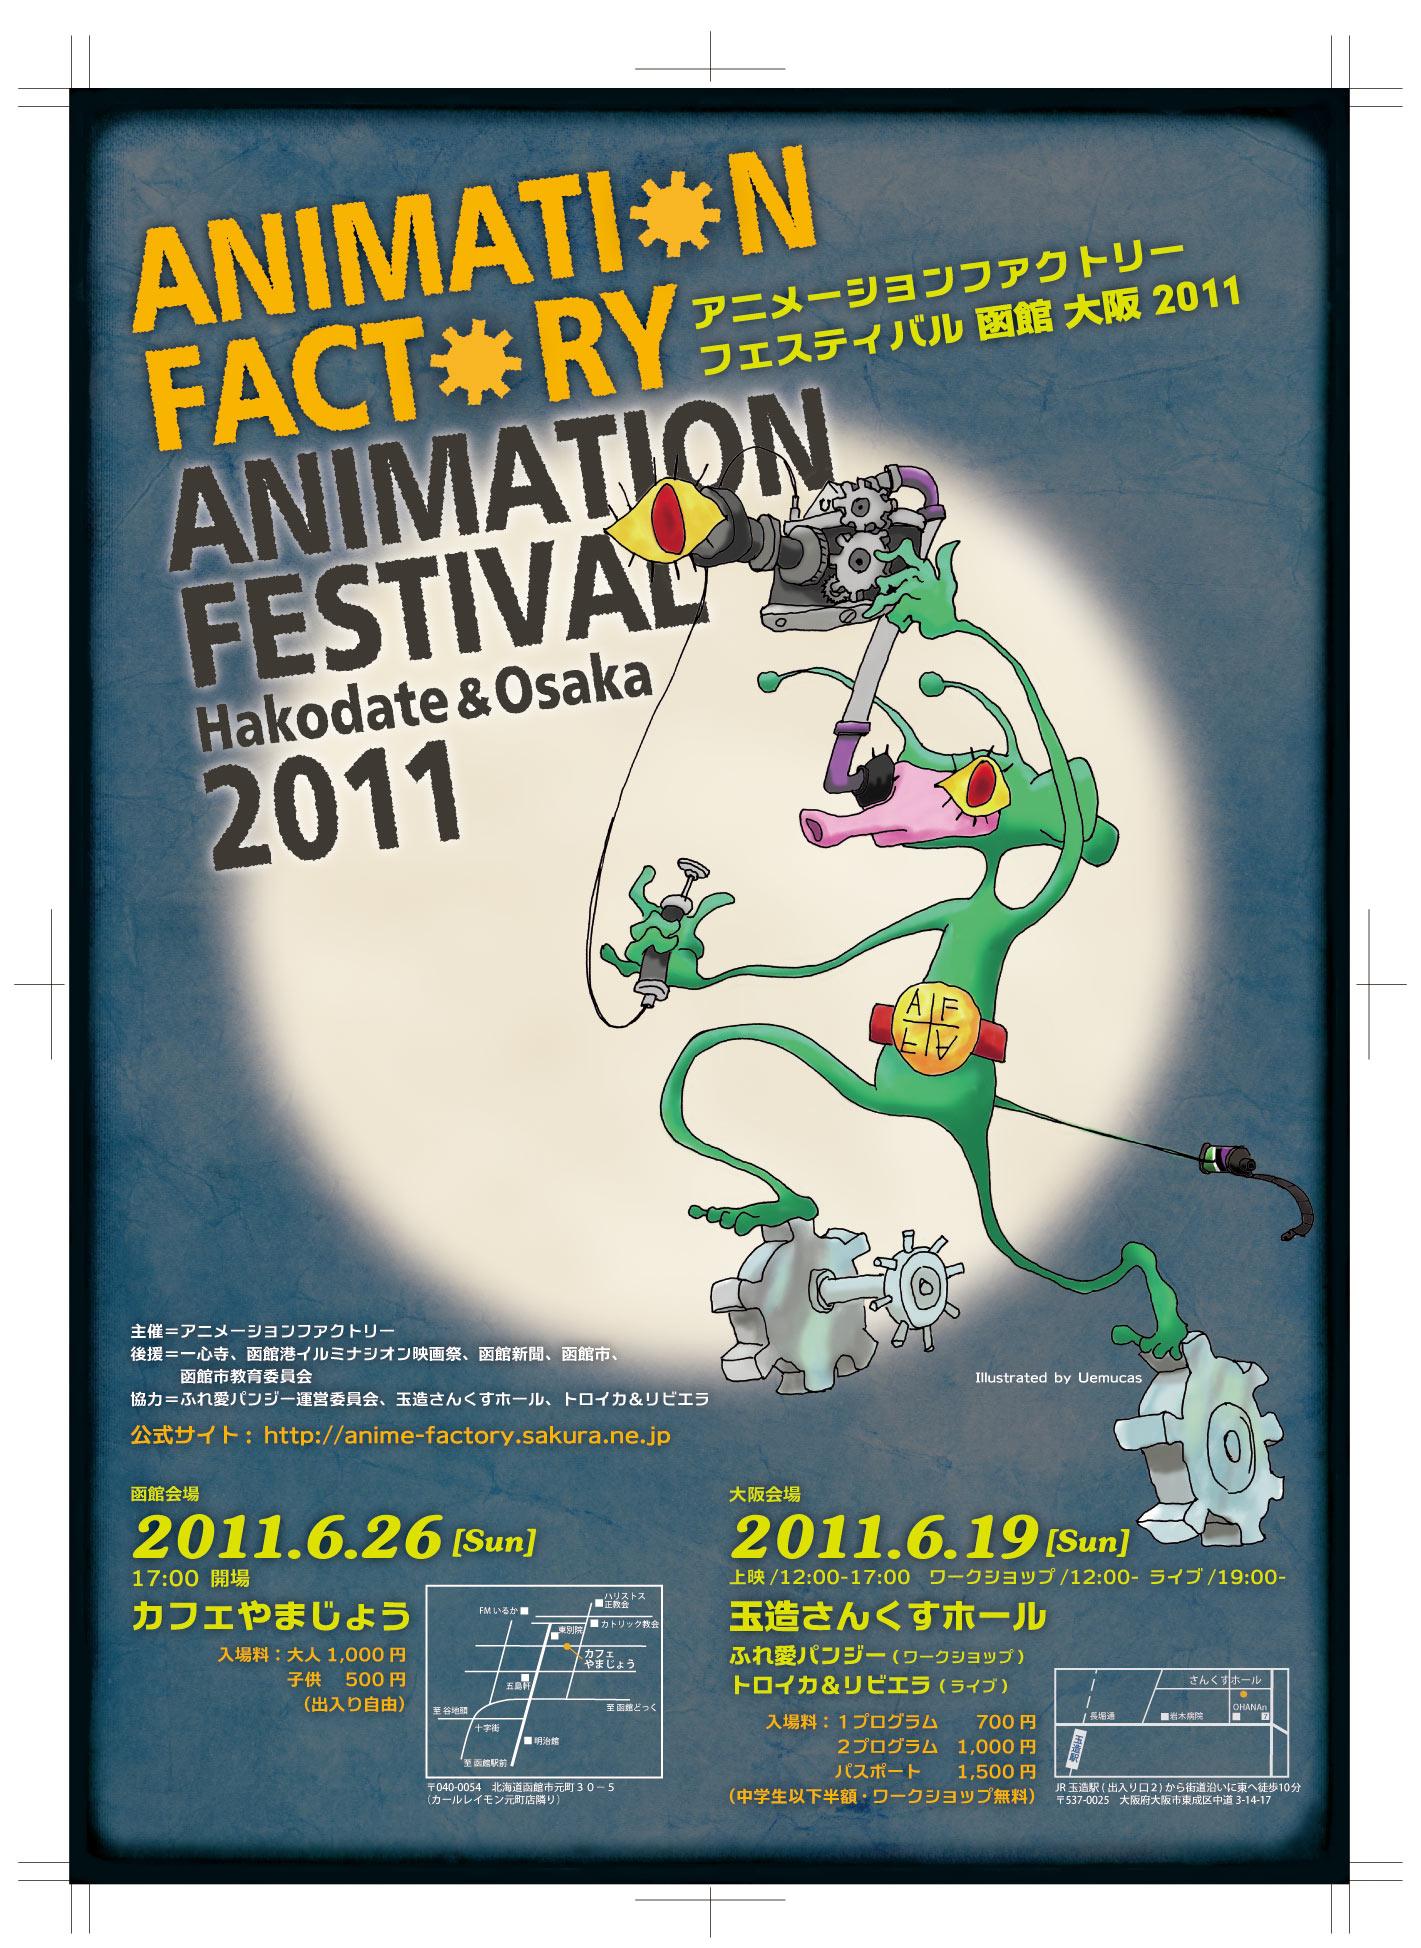 Animation Factory2011告知_f0023482_4512995.jpg